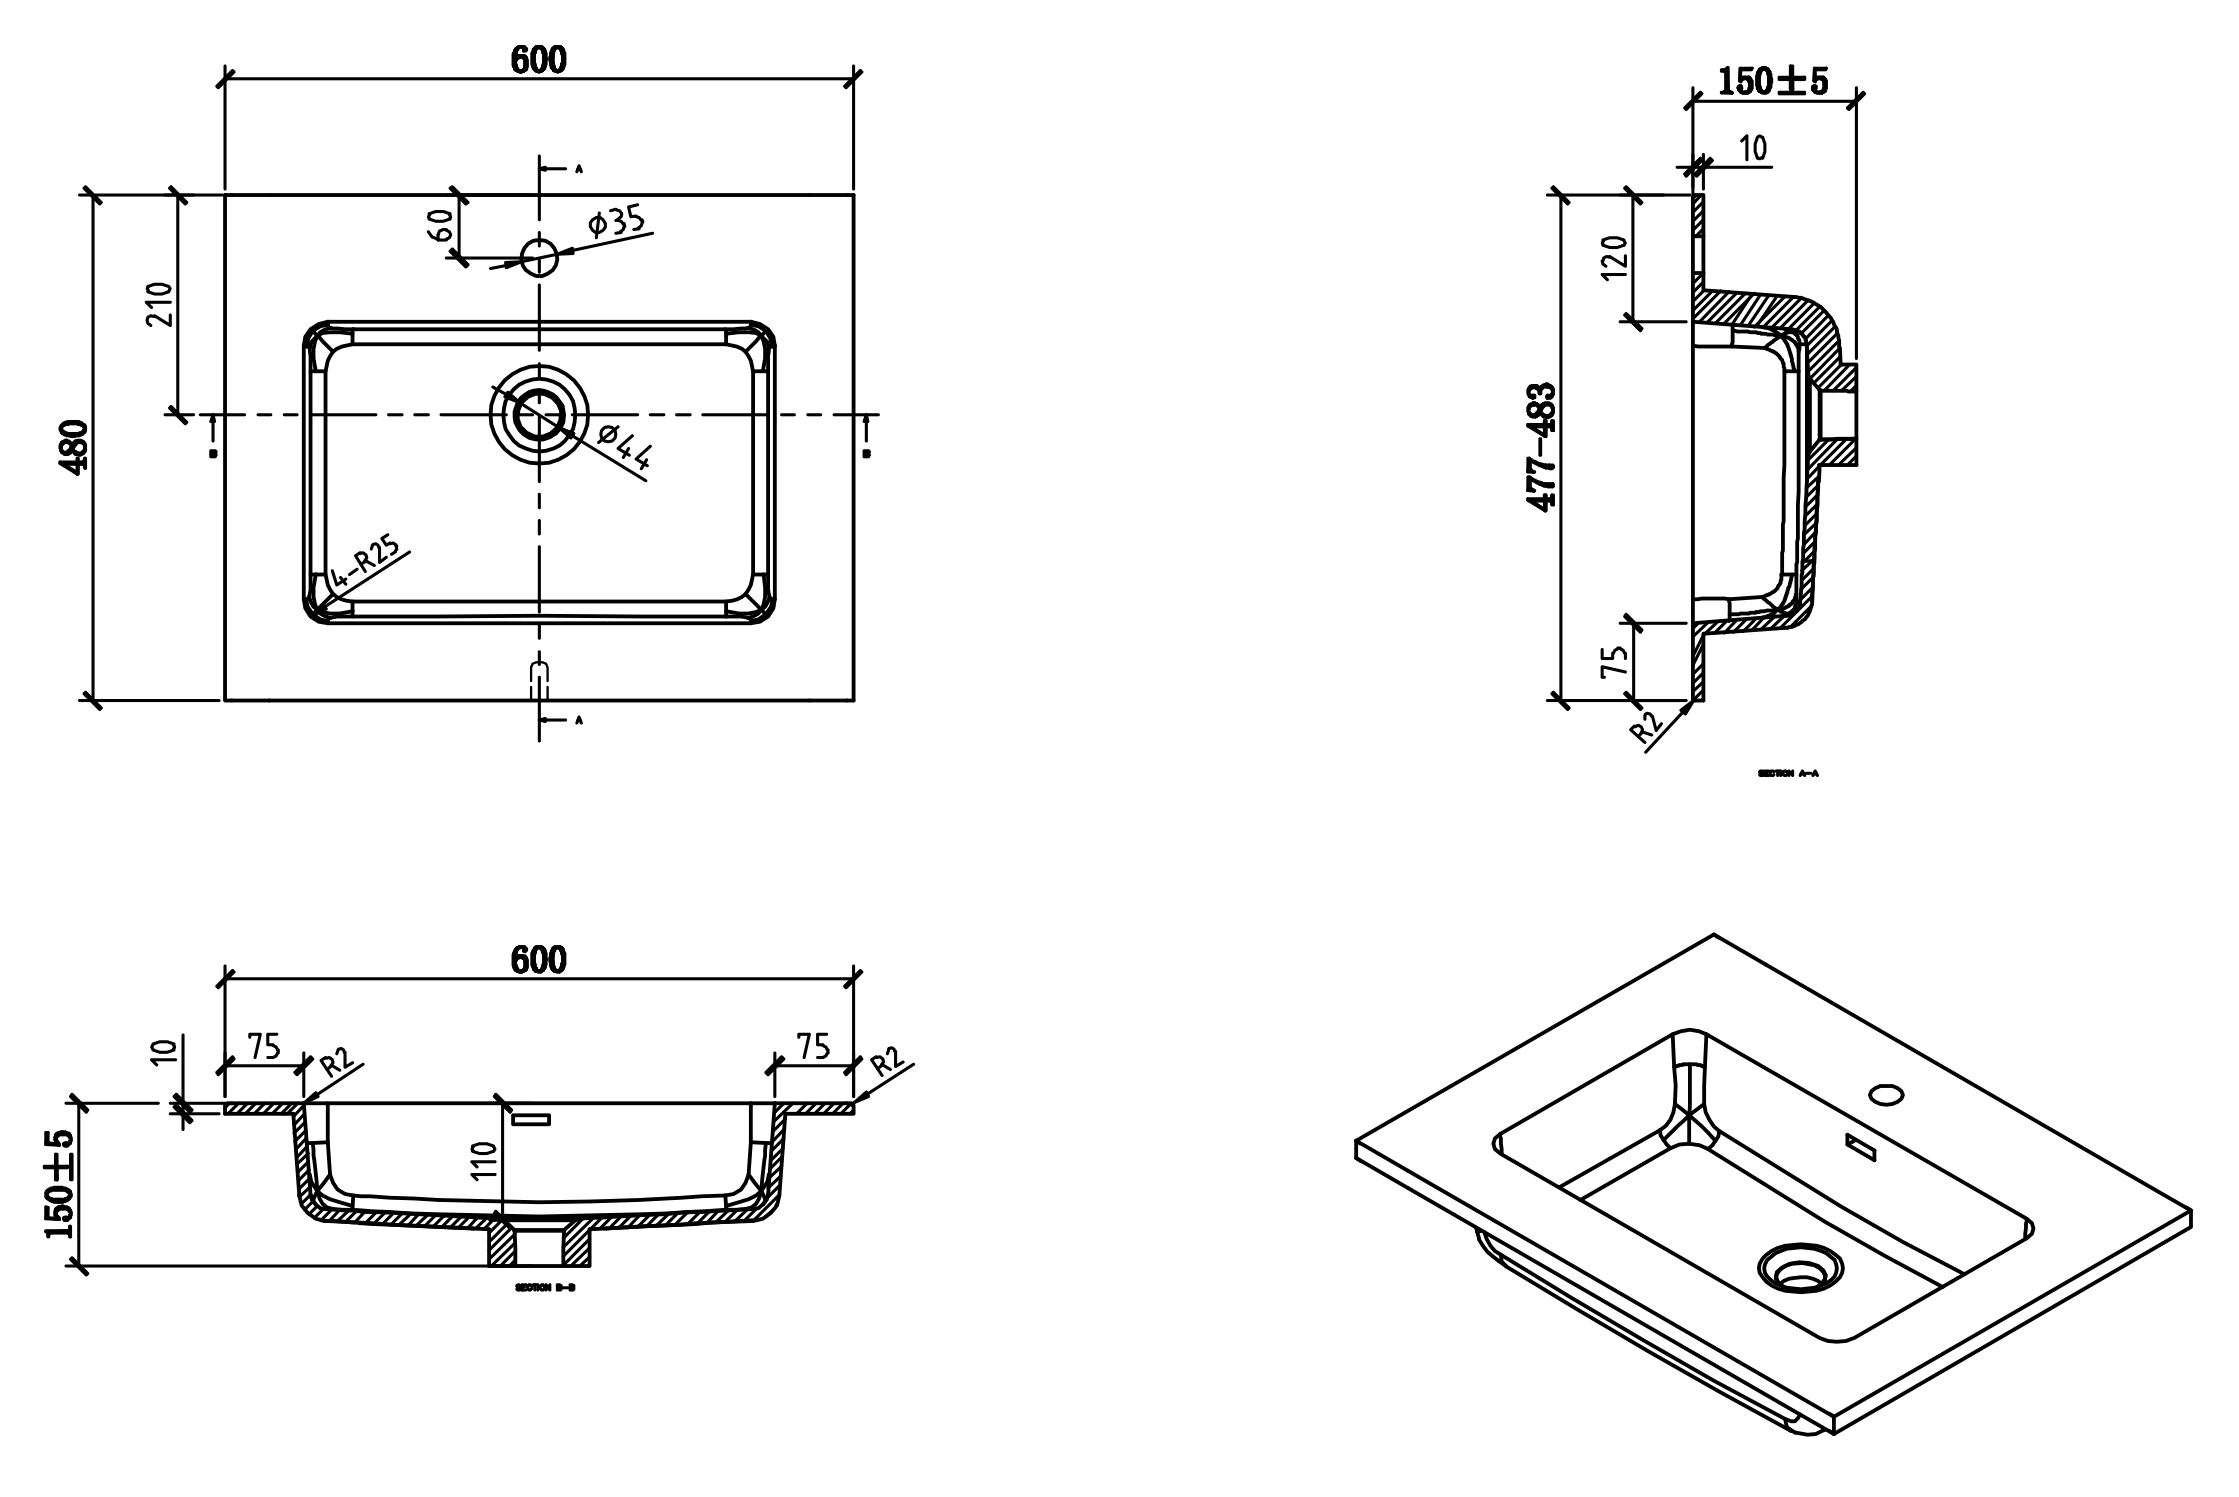 Alice 600 wash basin - Drawing